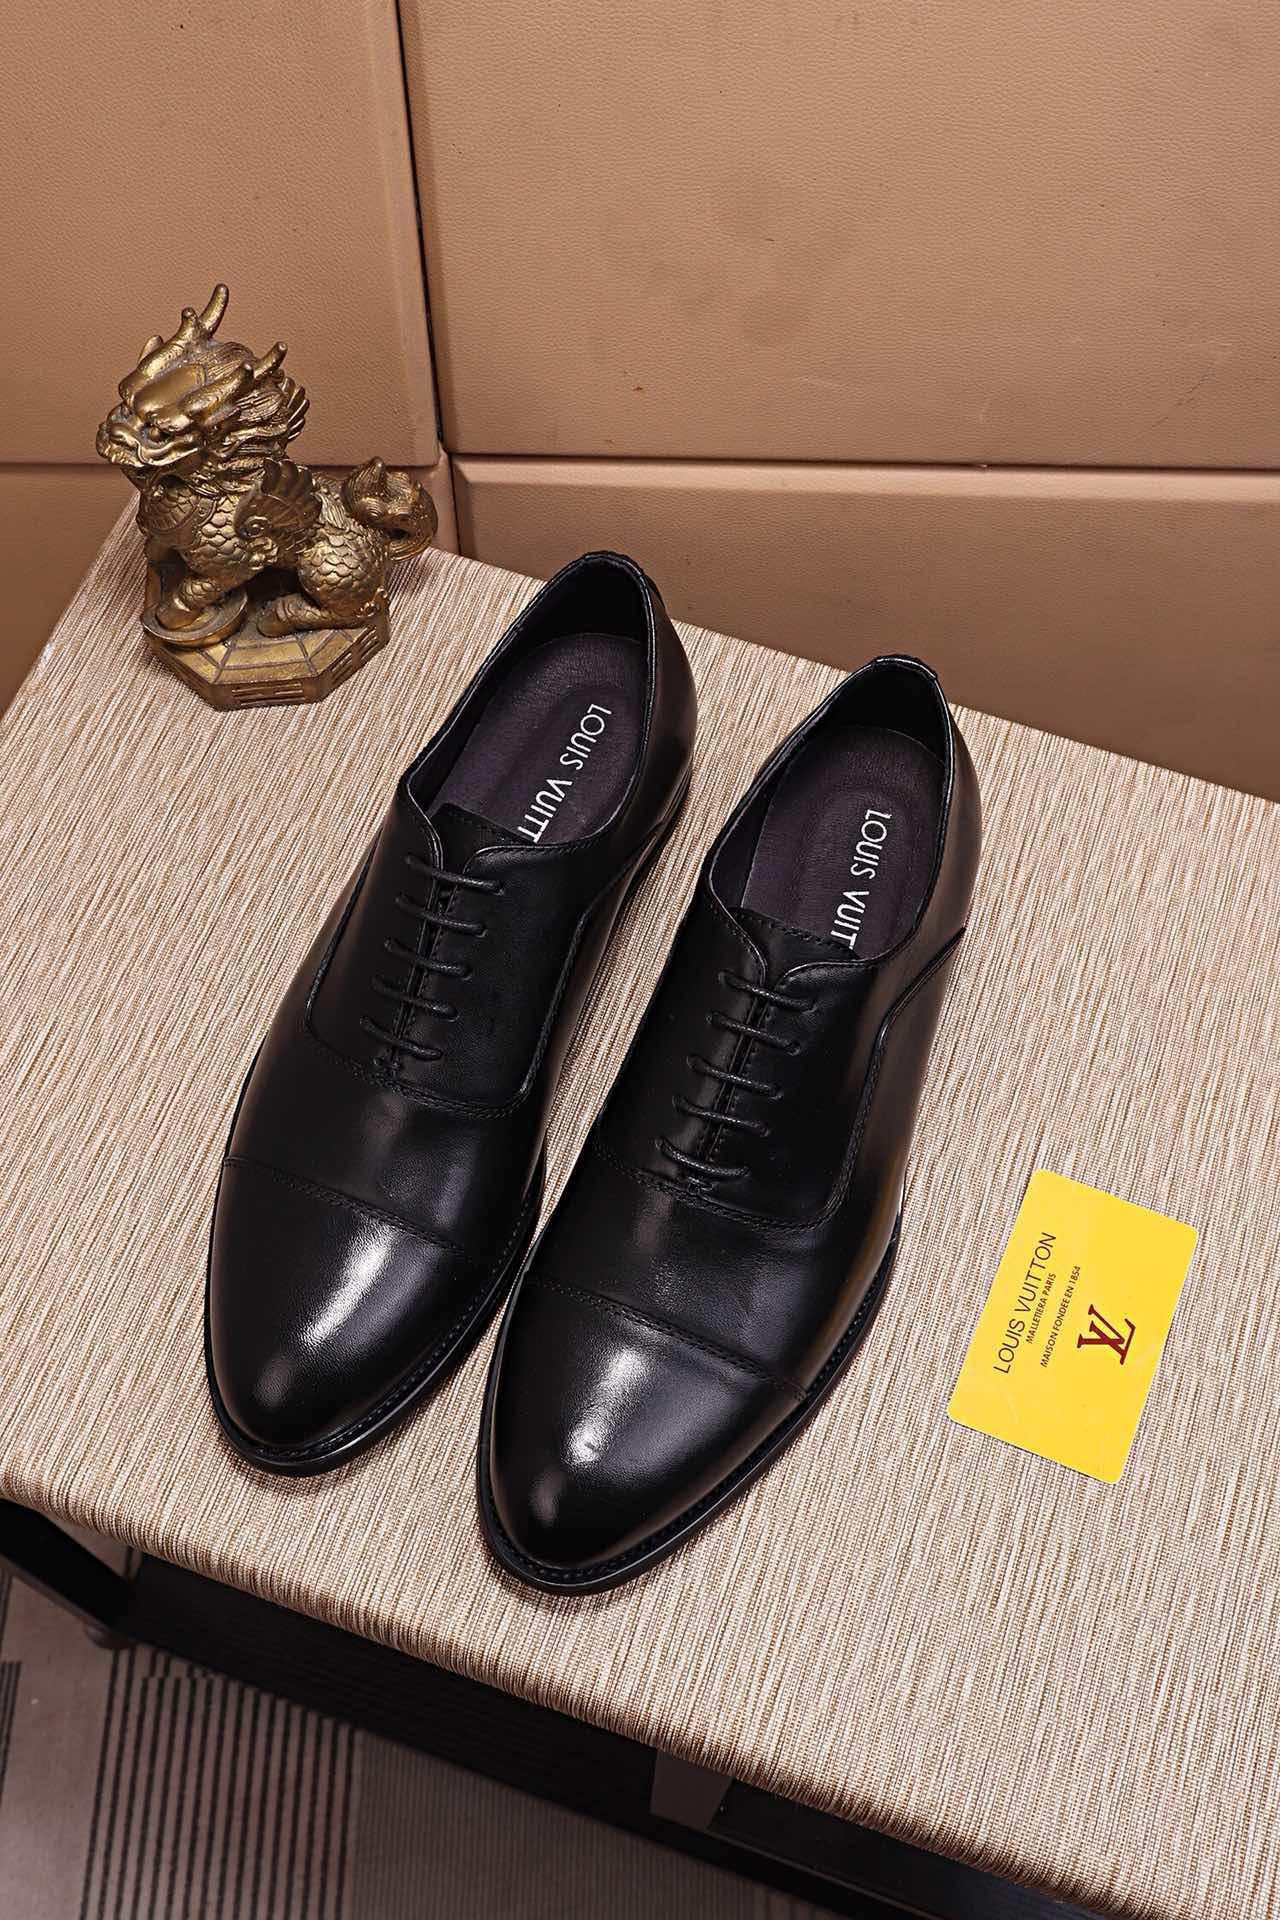 Louis Vuitton ルイヴィトン 偽物 メンズ 靴 代金引換国内 2色